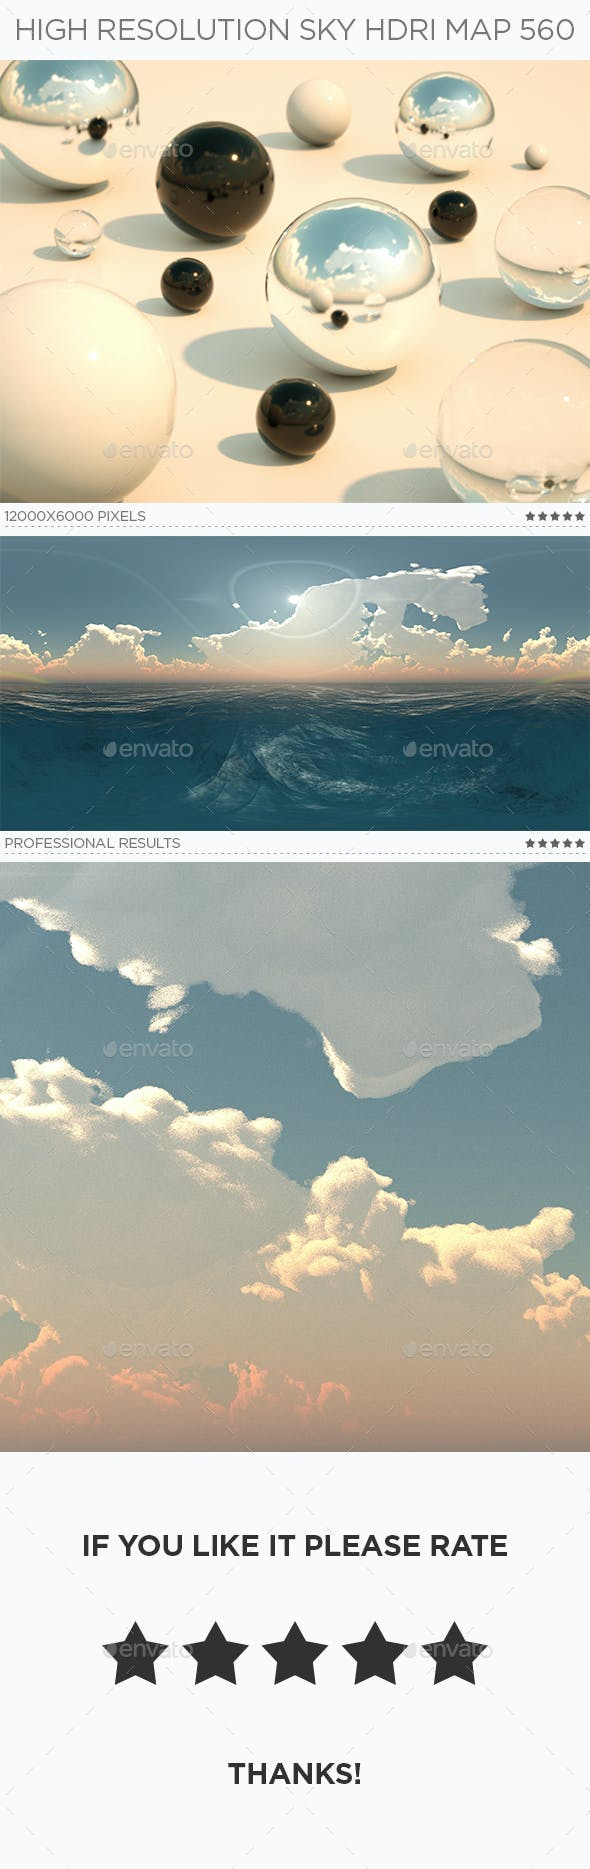 High Resolution Sky HDRi Map 560 - 3DOcean Item for Sale